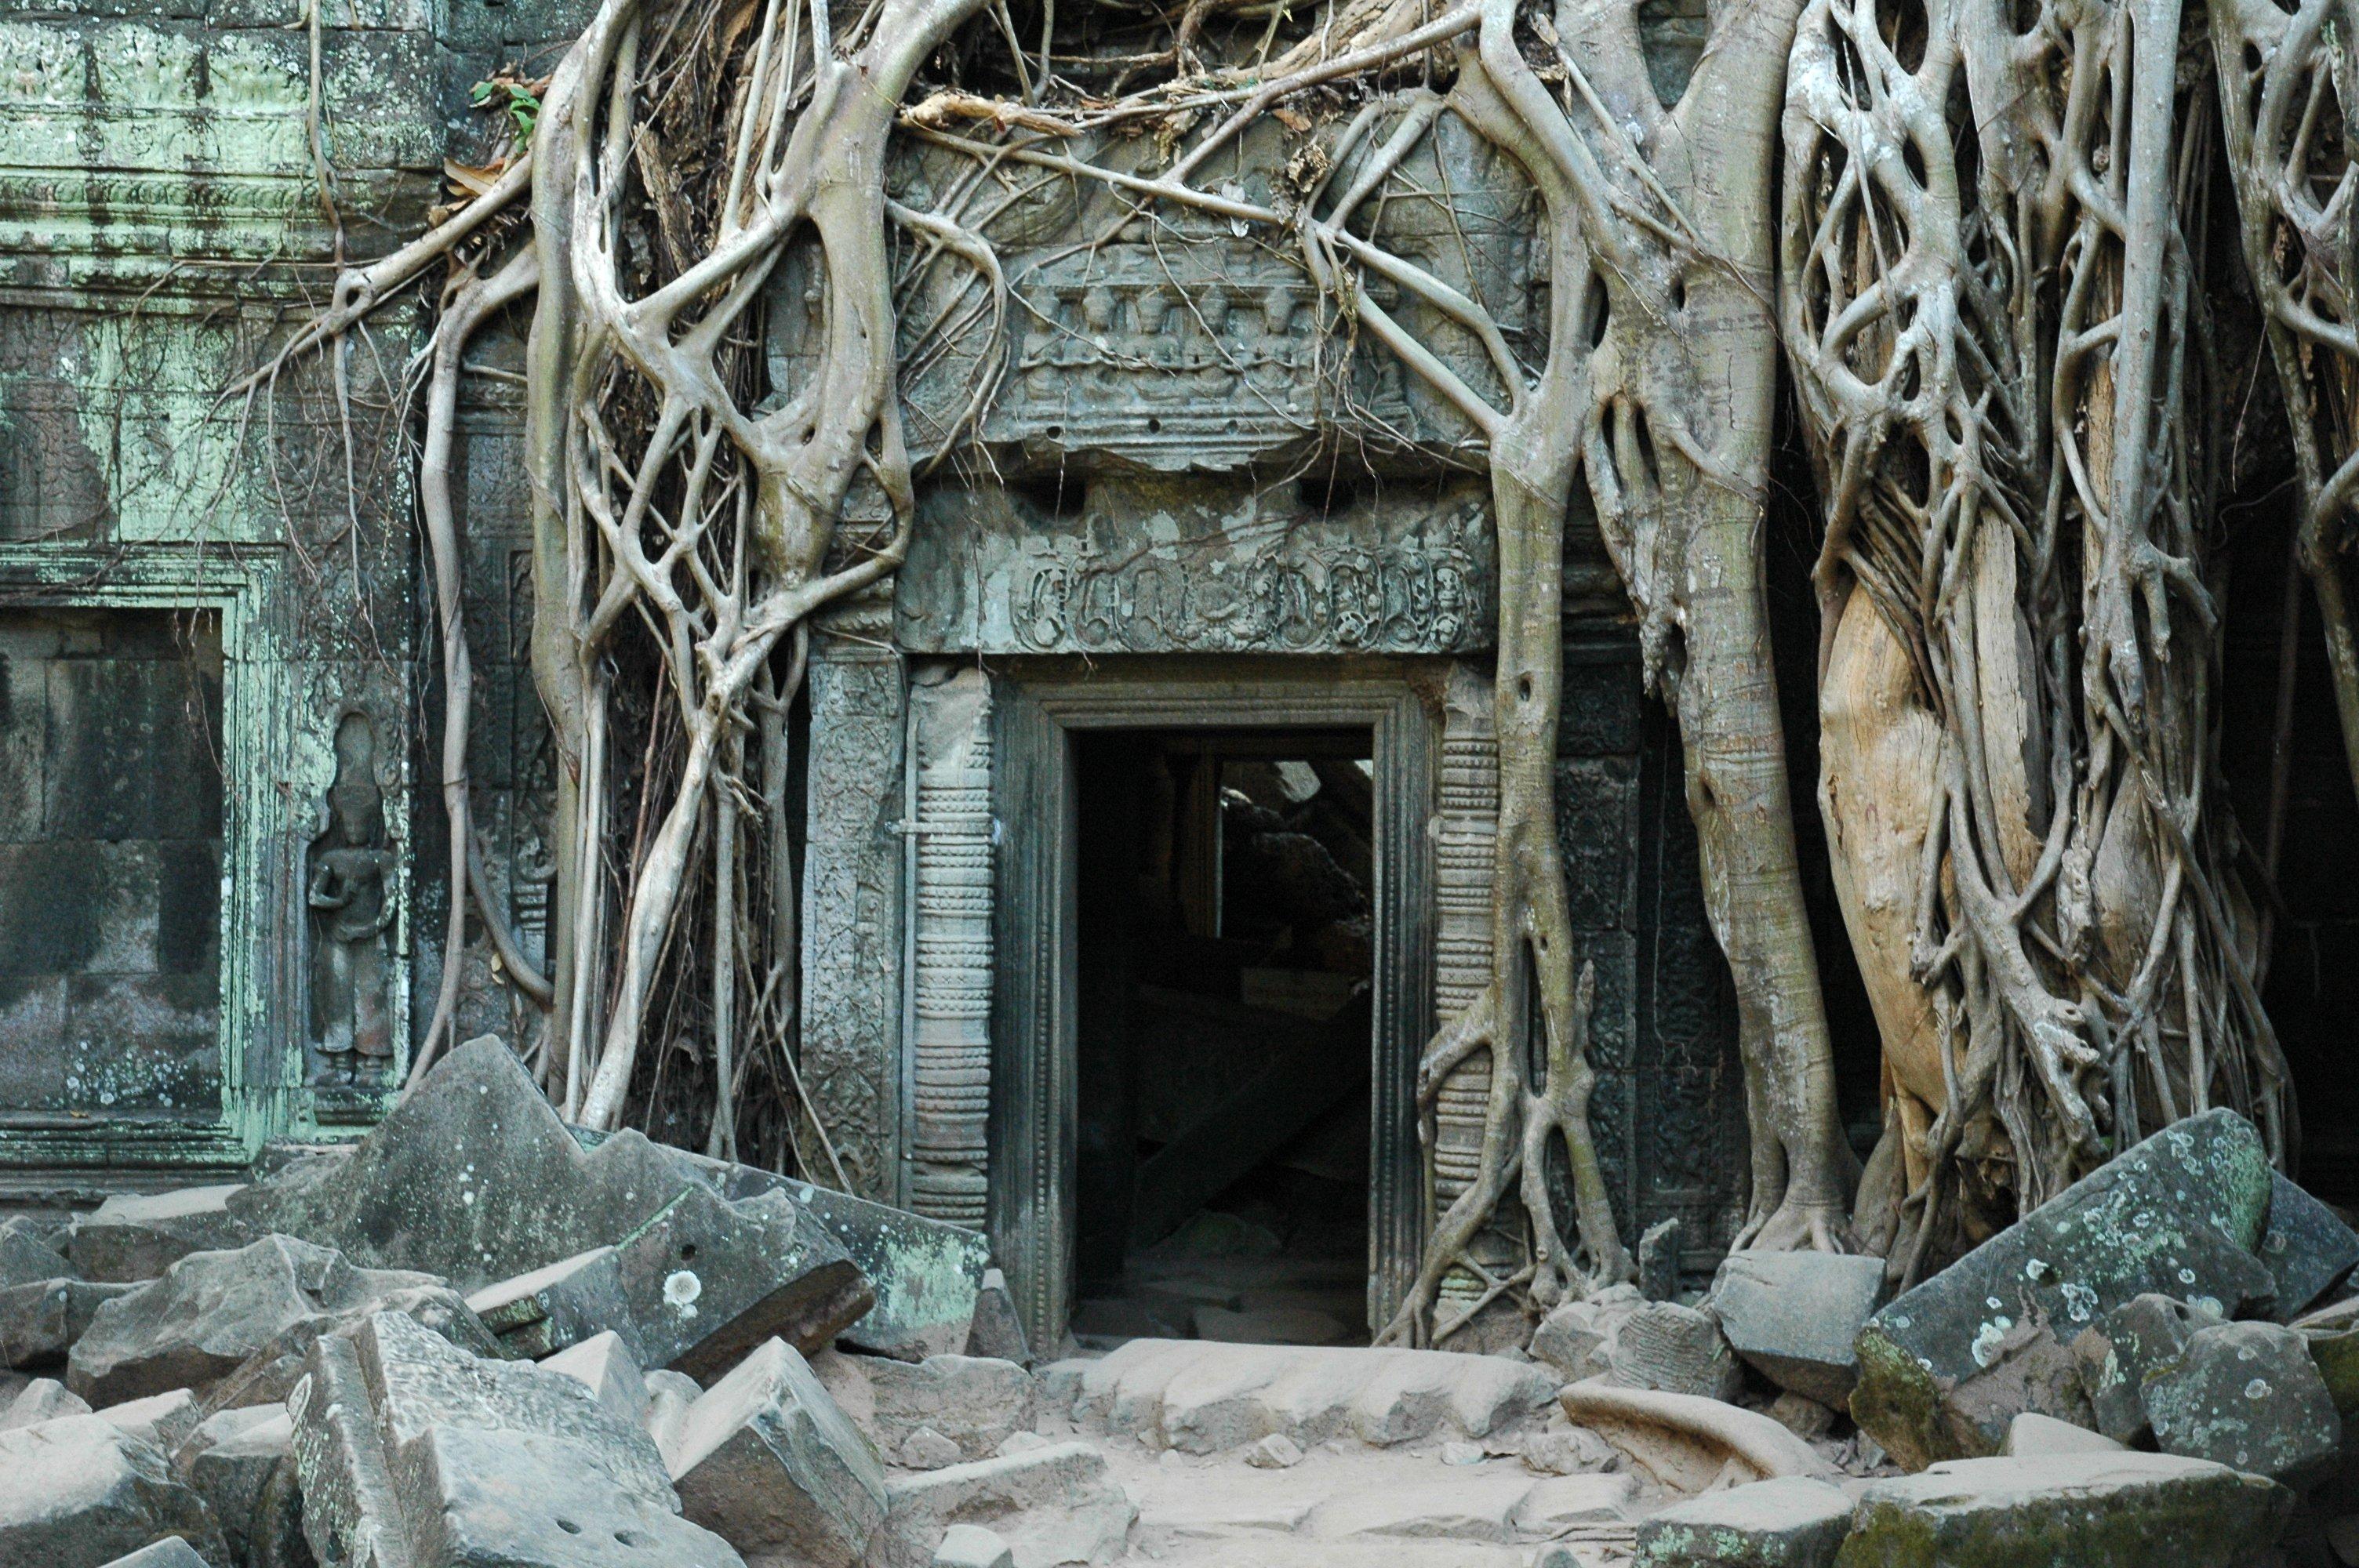 File:Doorway Empty.JPG - Wikimedia Commons